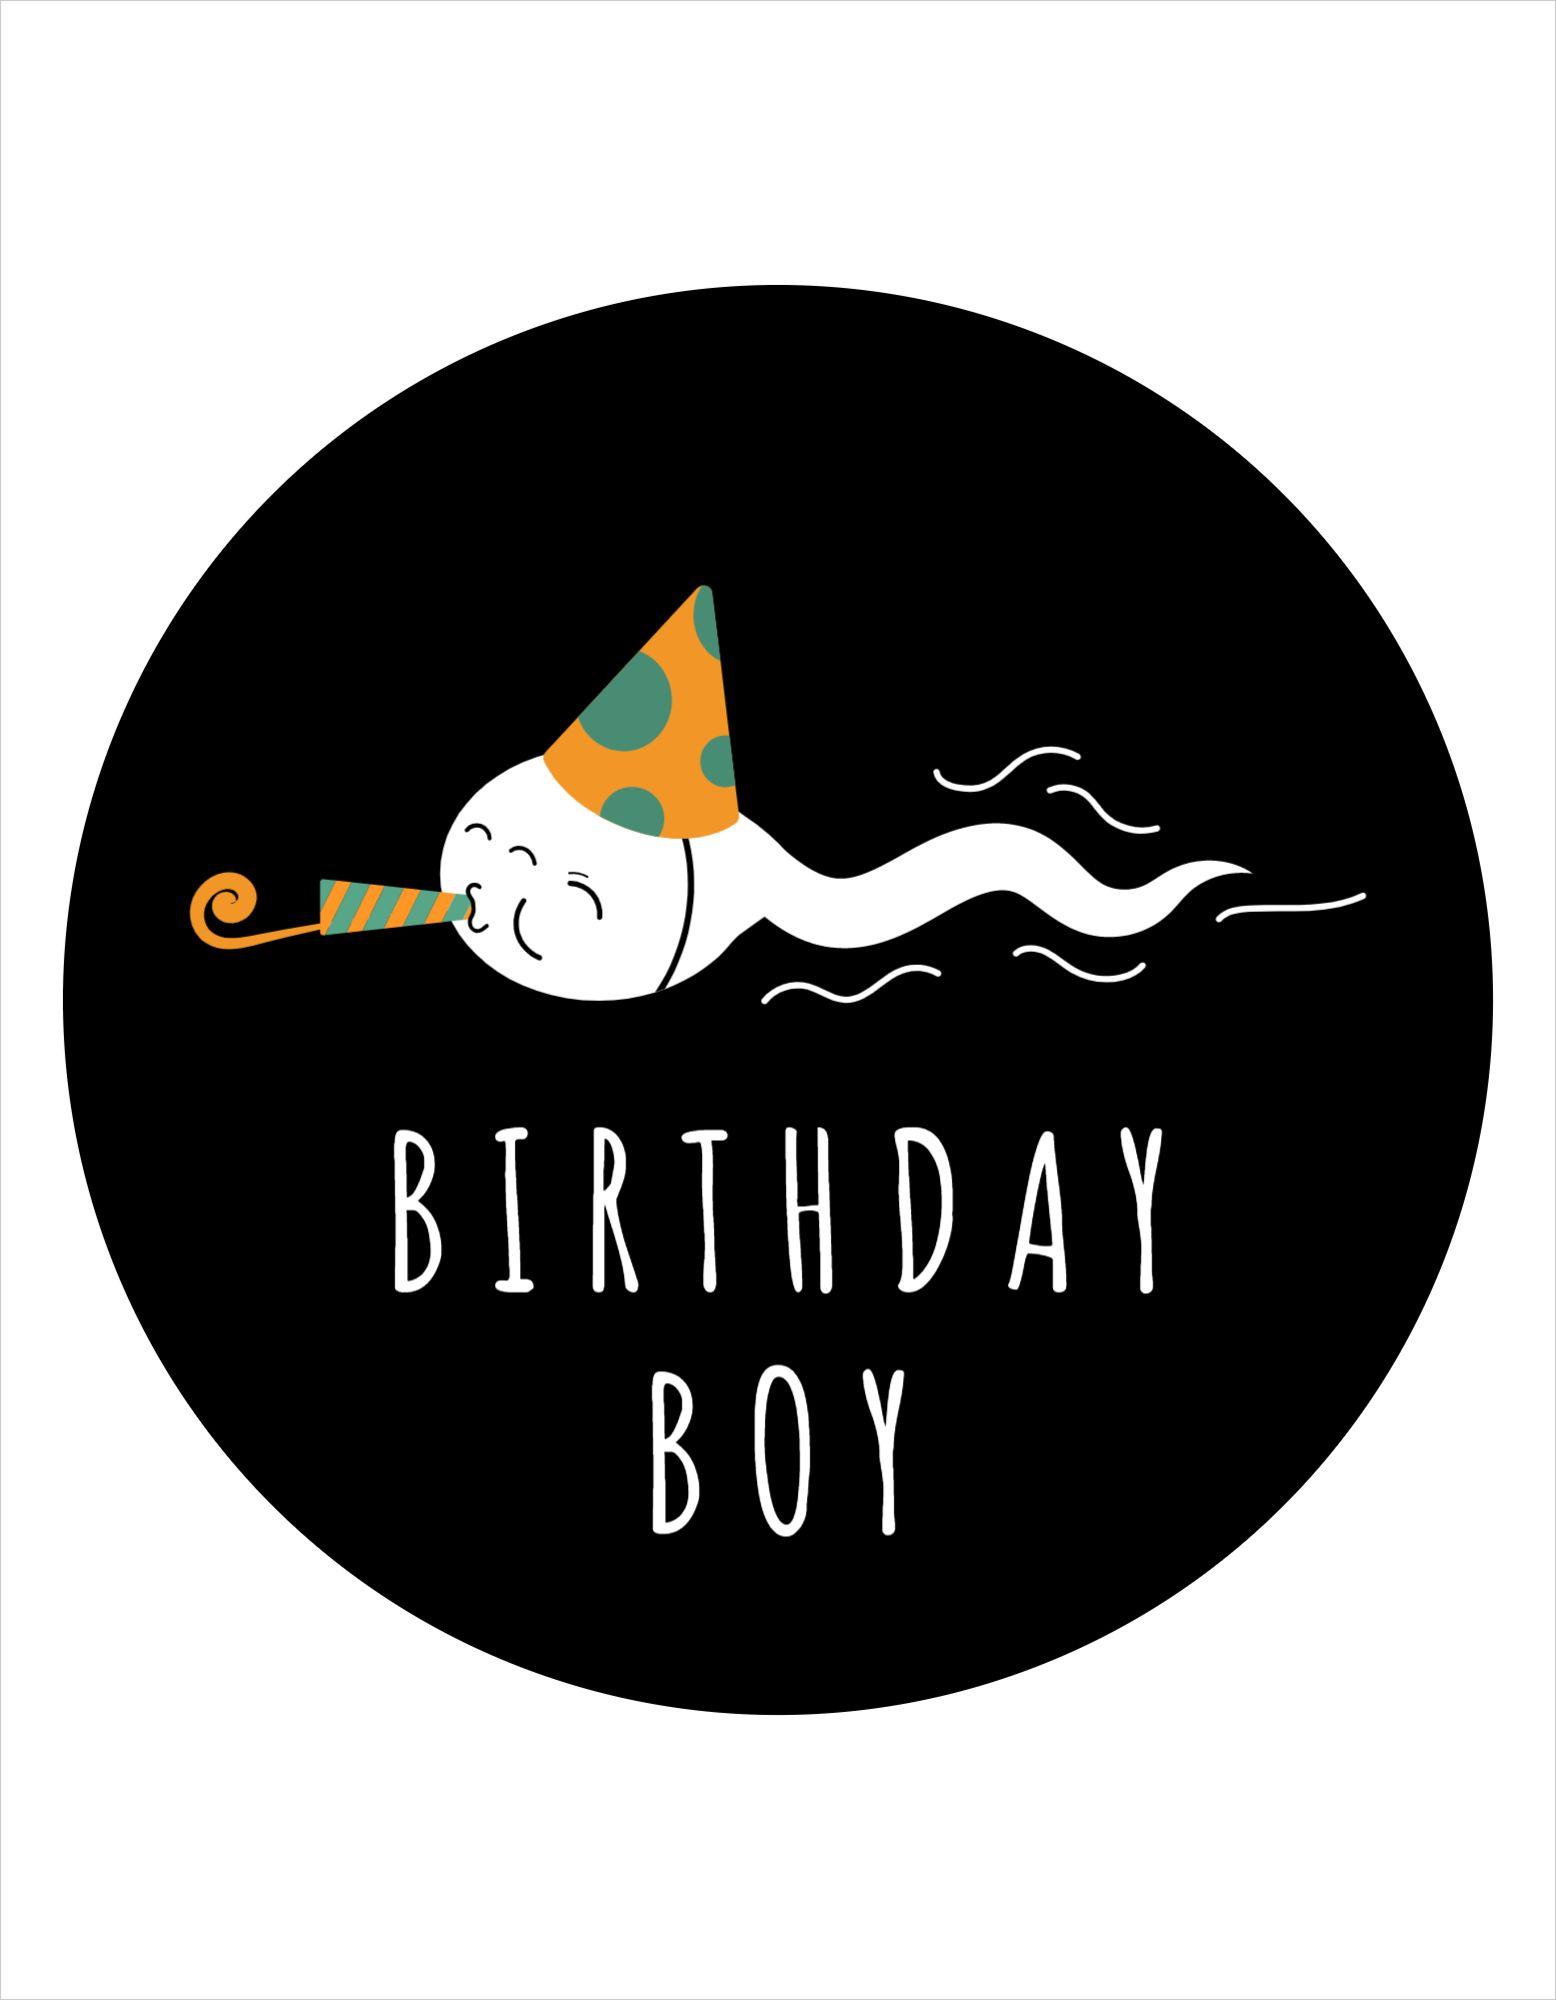 Birthday Boy T-Shirt Design Template